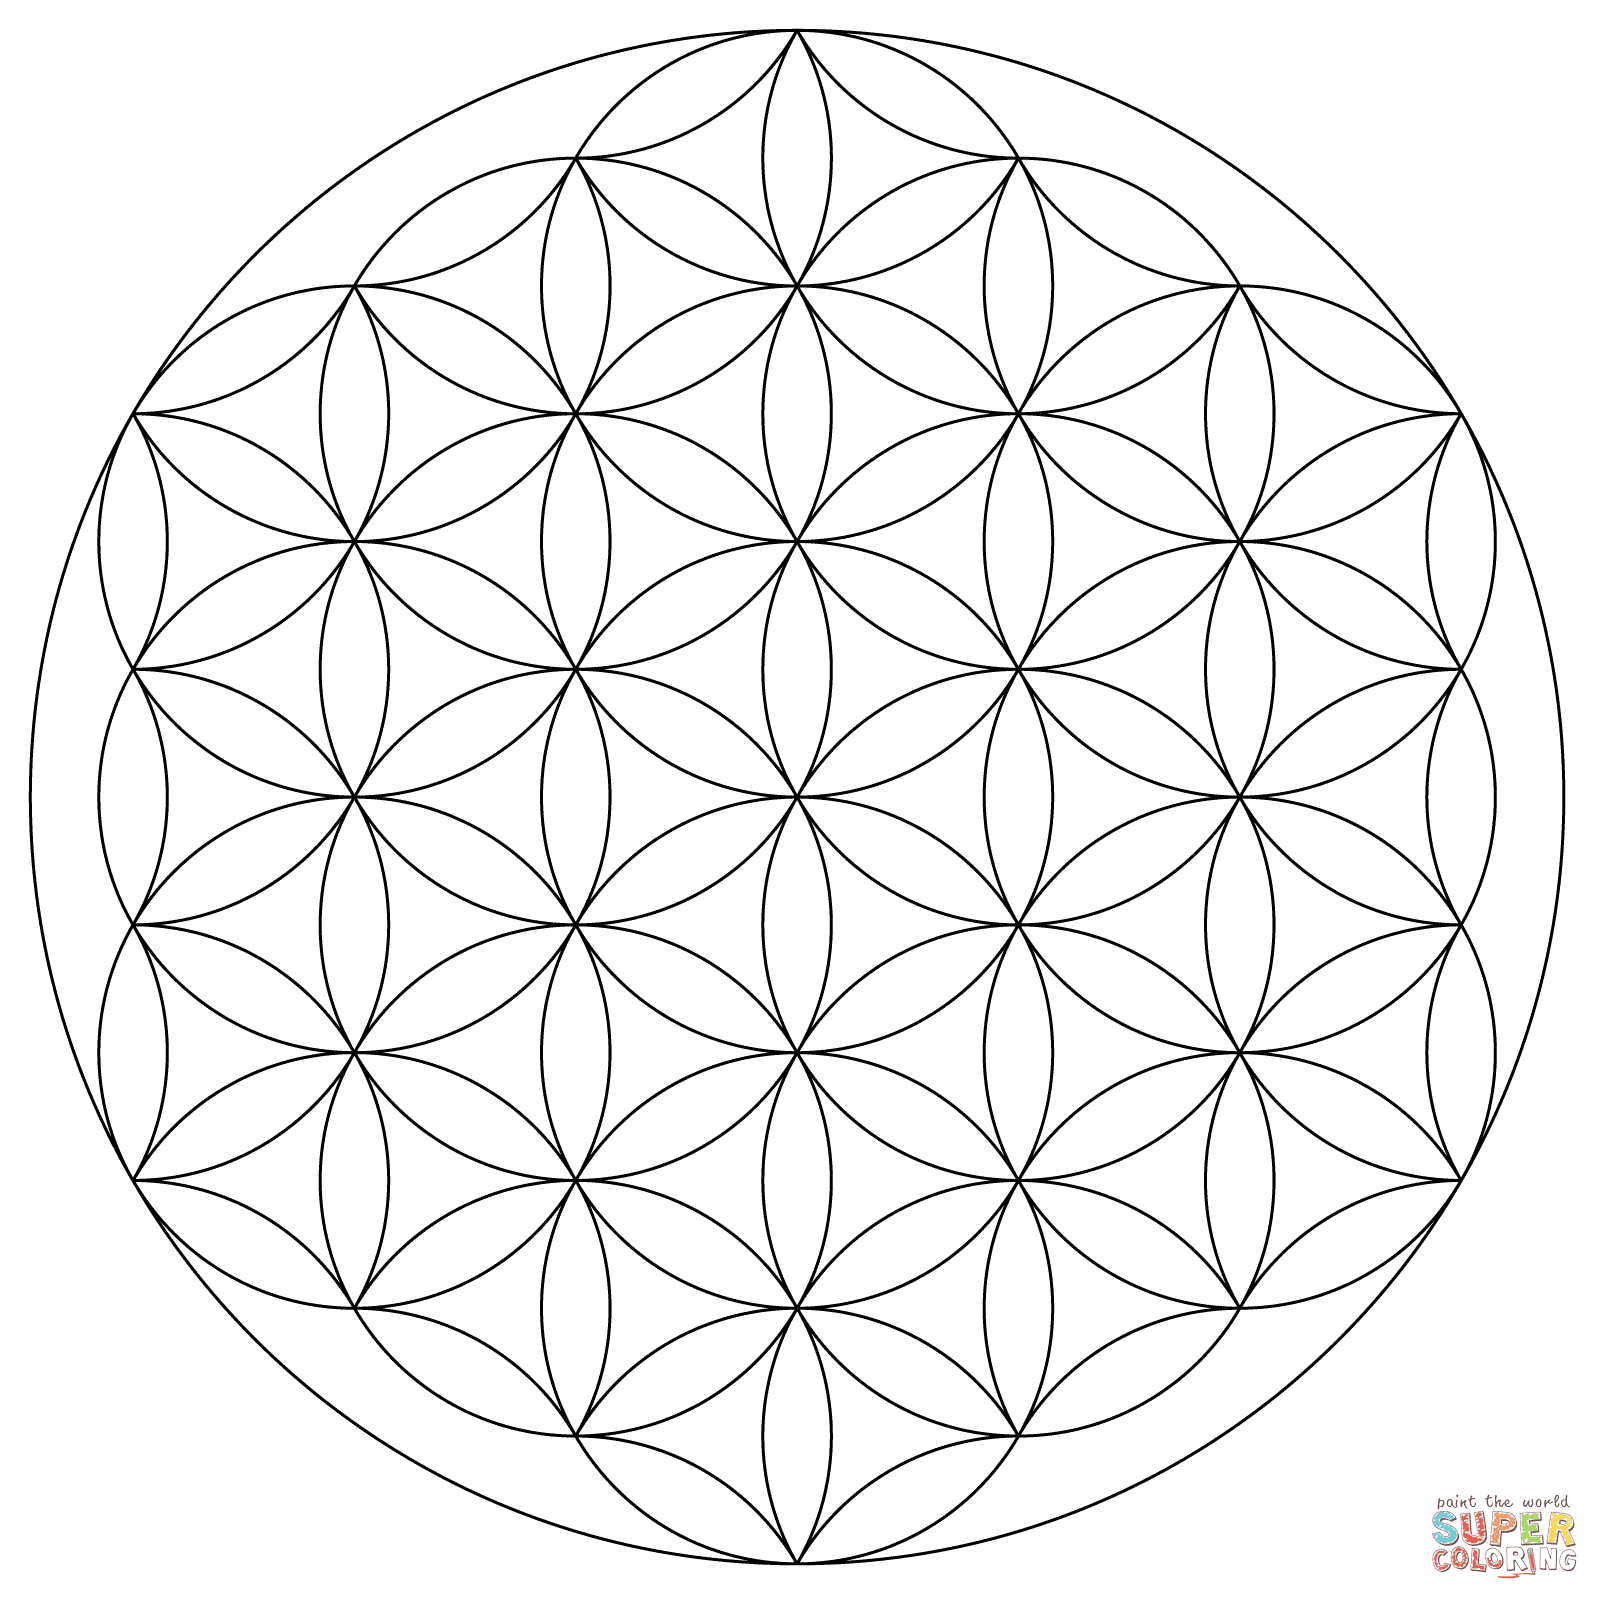 Dibujo De Mandala Flor De La Vida Para Colorear Dibujos Para